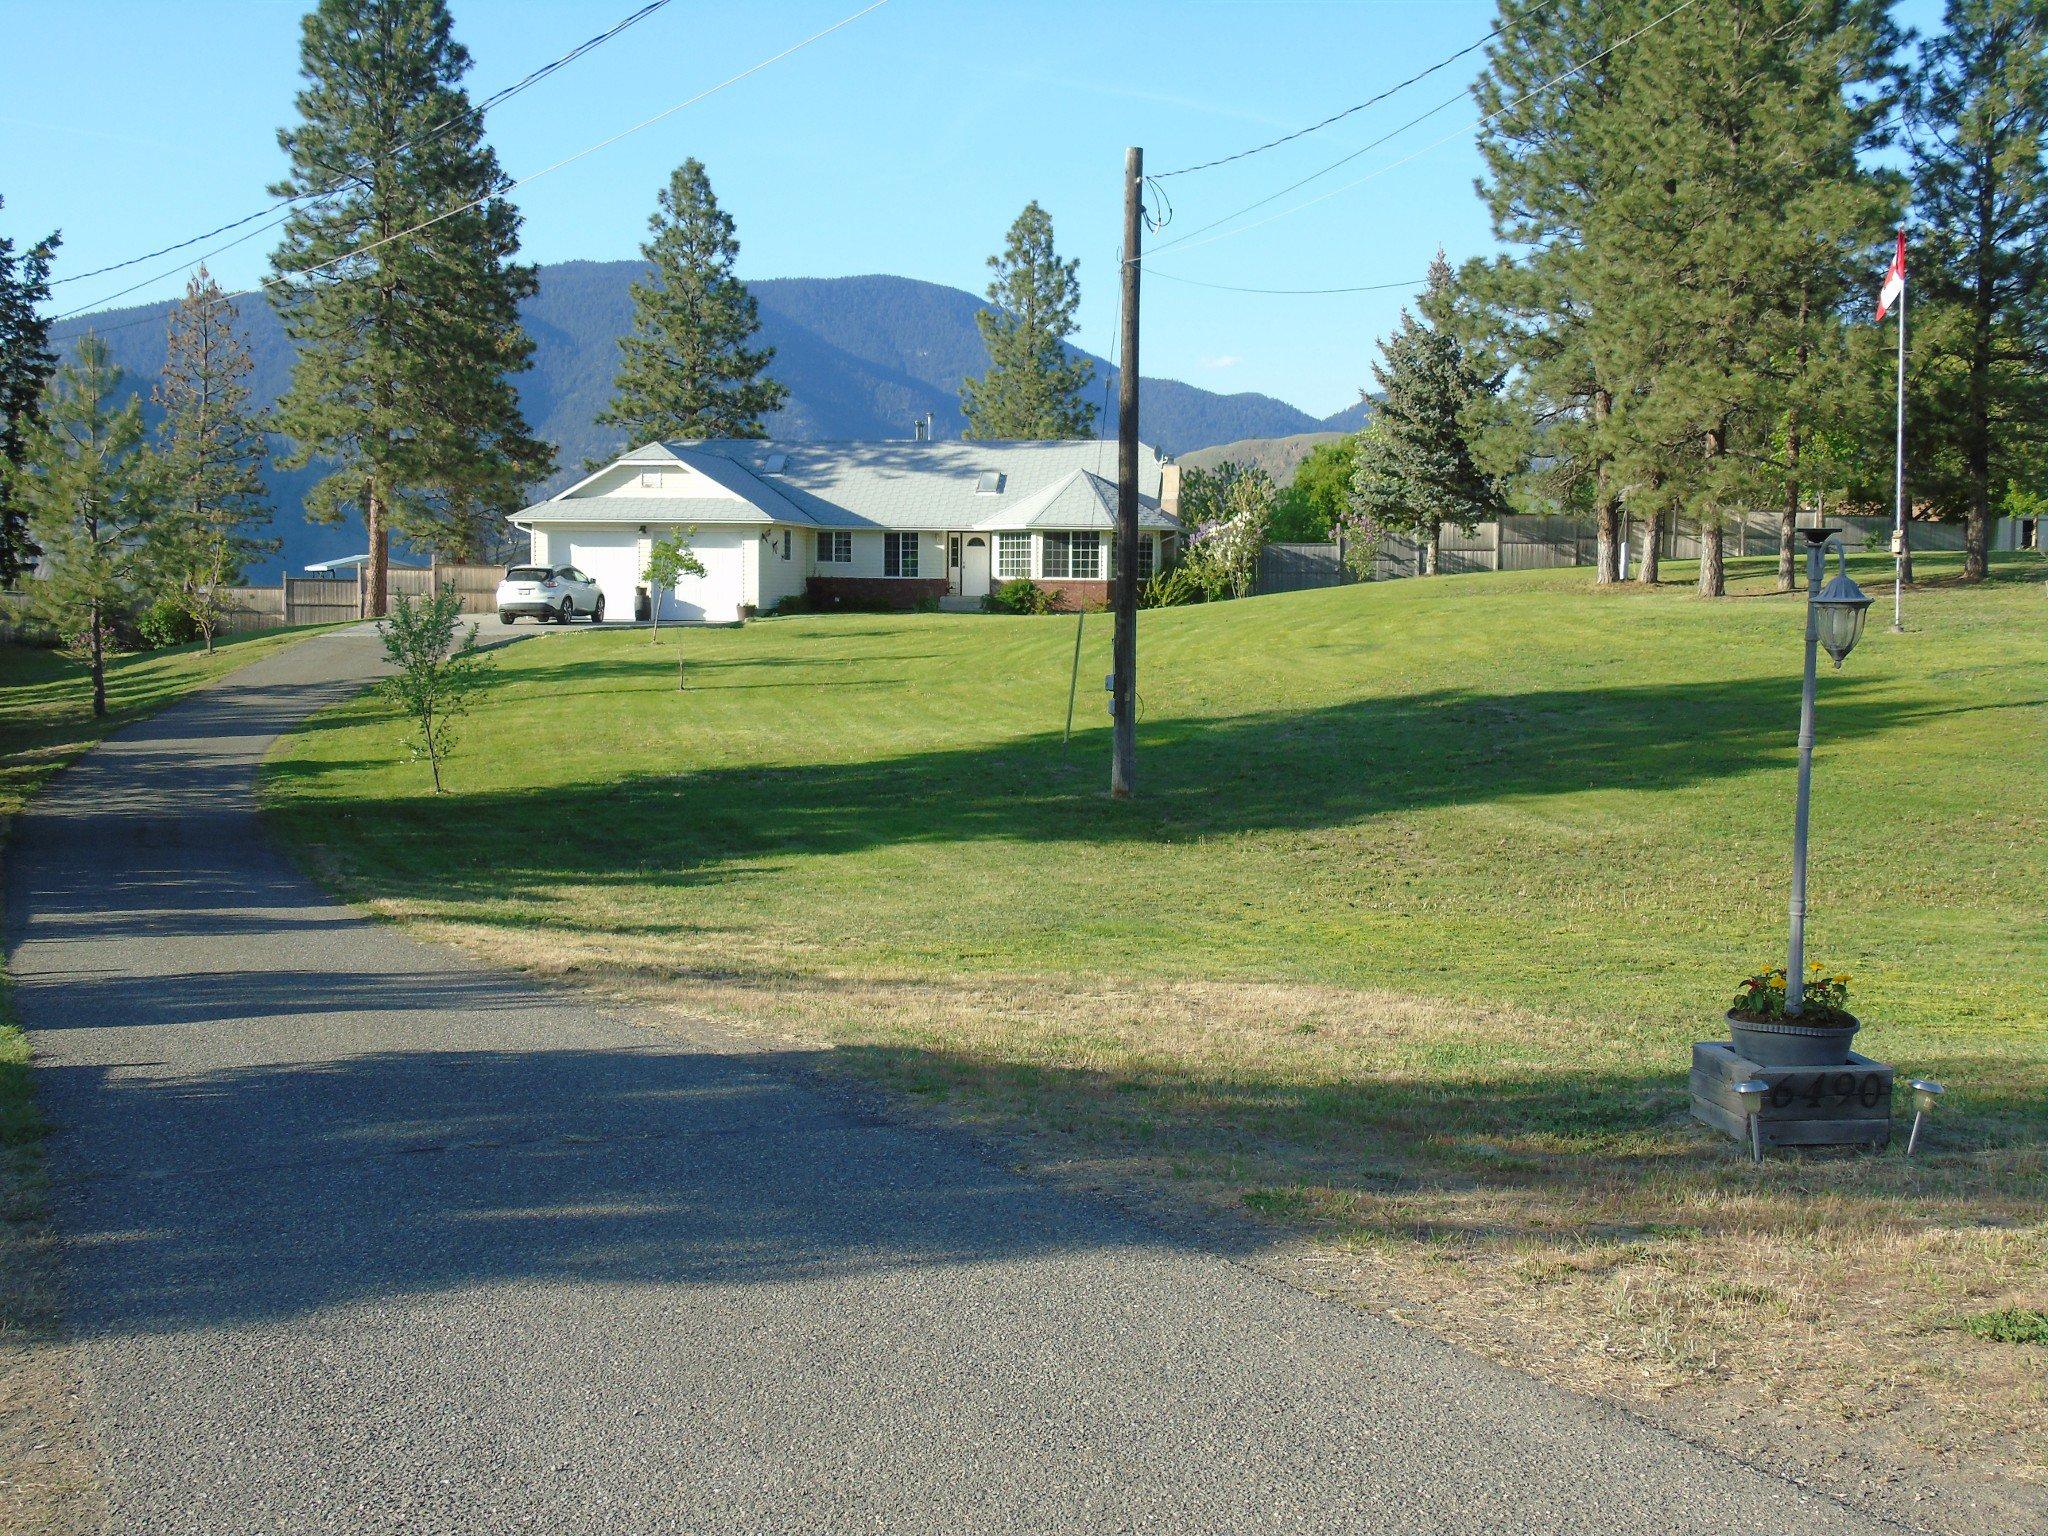 Photo 2: Photos: 6490 Barnhartvale Road in Kamloops: Barnhartvale House for sale : MLS®# New